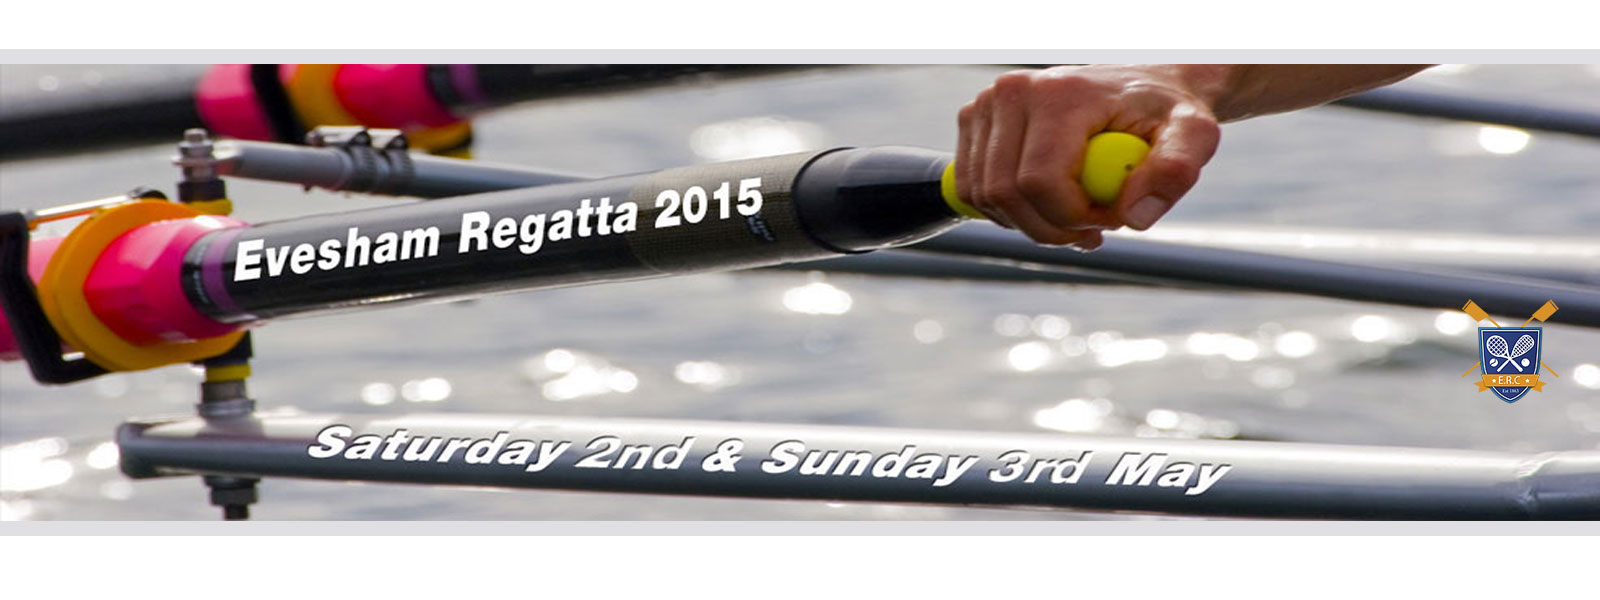 regatta-2015